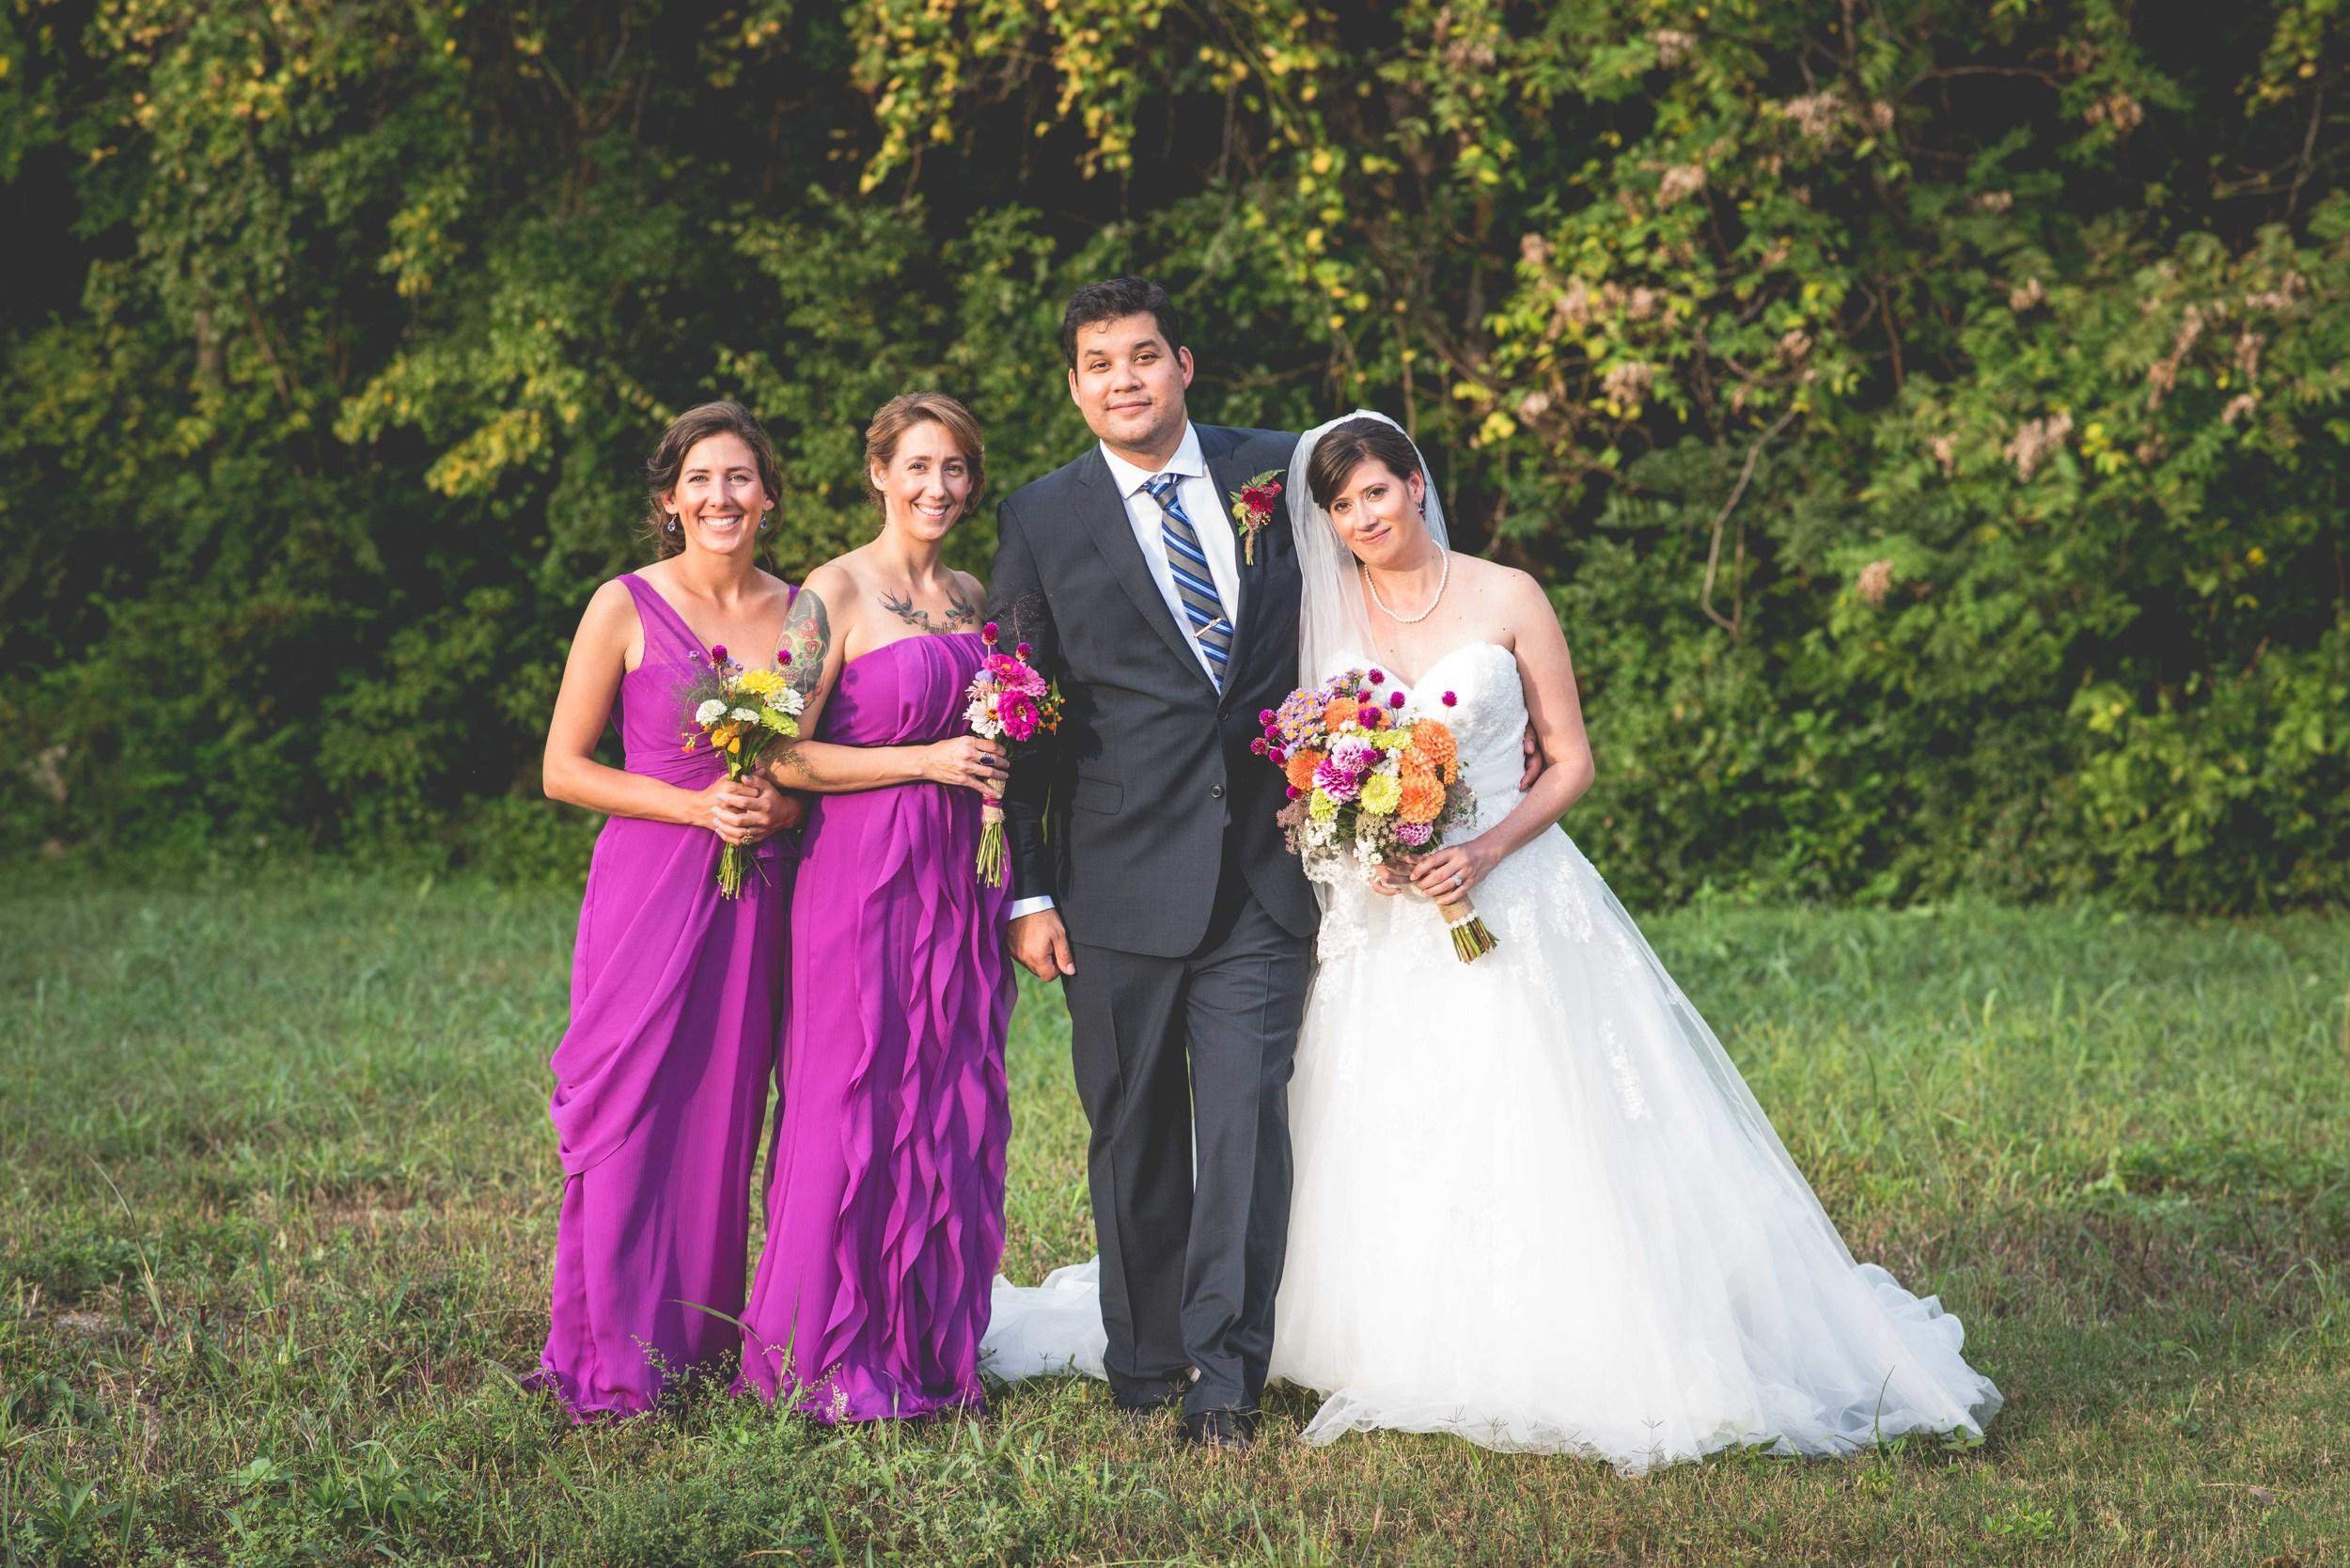 Nashville Wedding Photographer Nashville Wedding Photographers Nashville Wedding Photography Nashville TN Wedding Photographer destination wedding photographer destination wedding photography